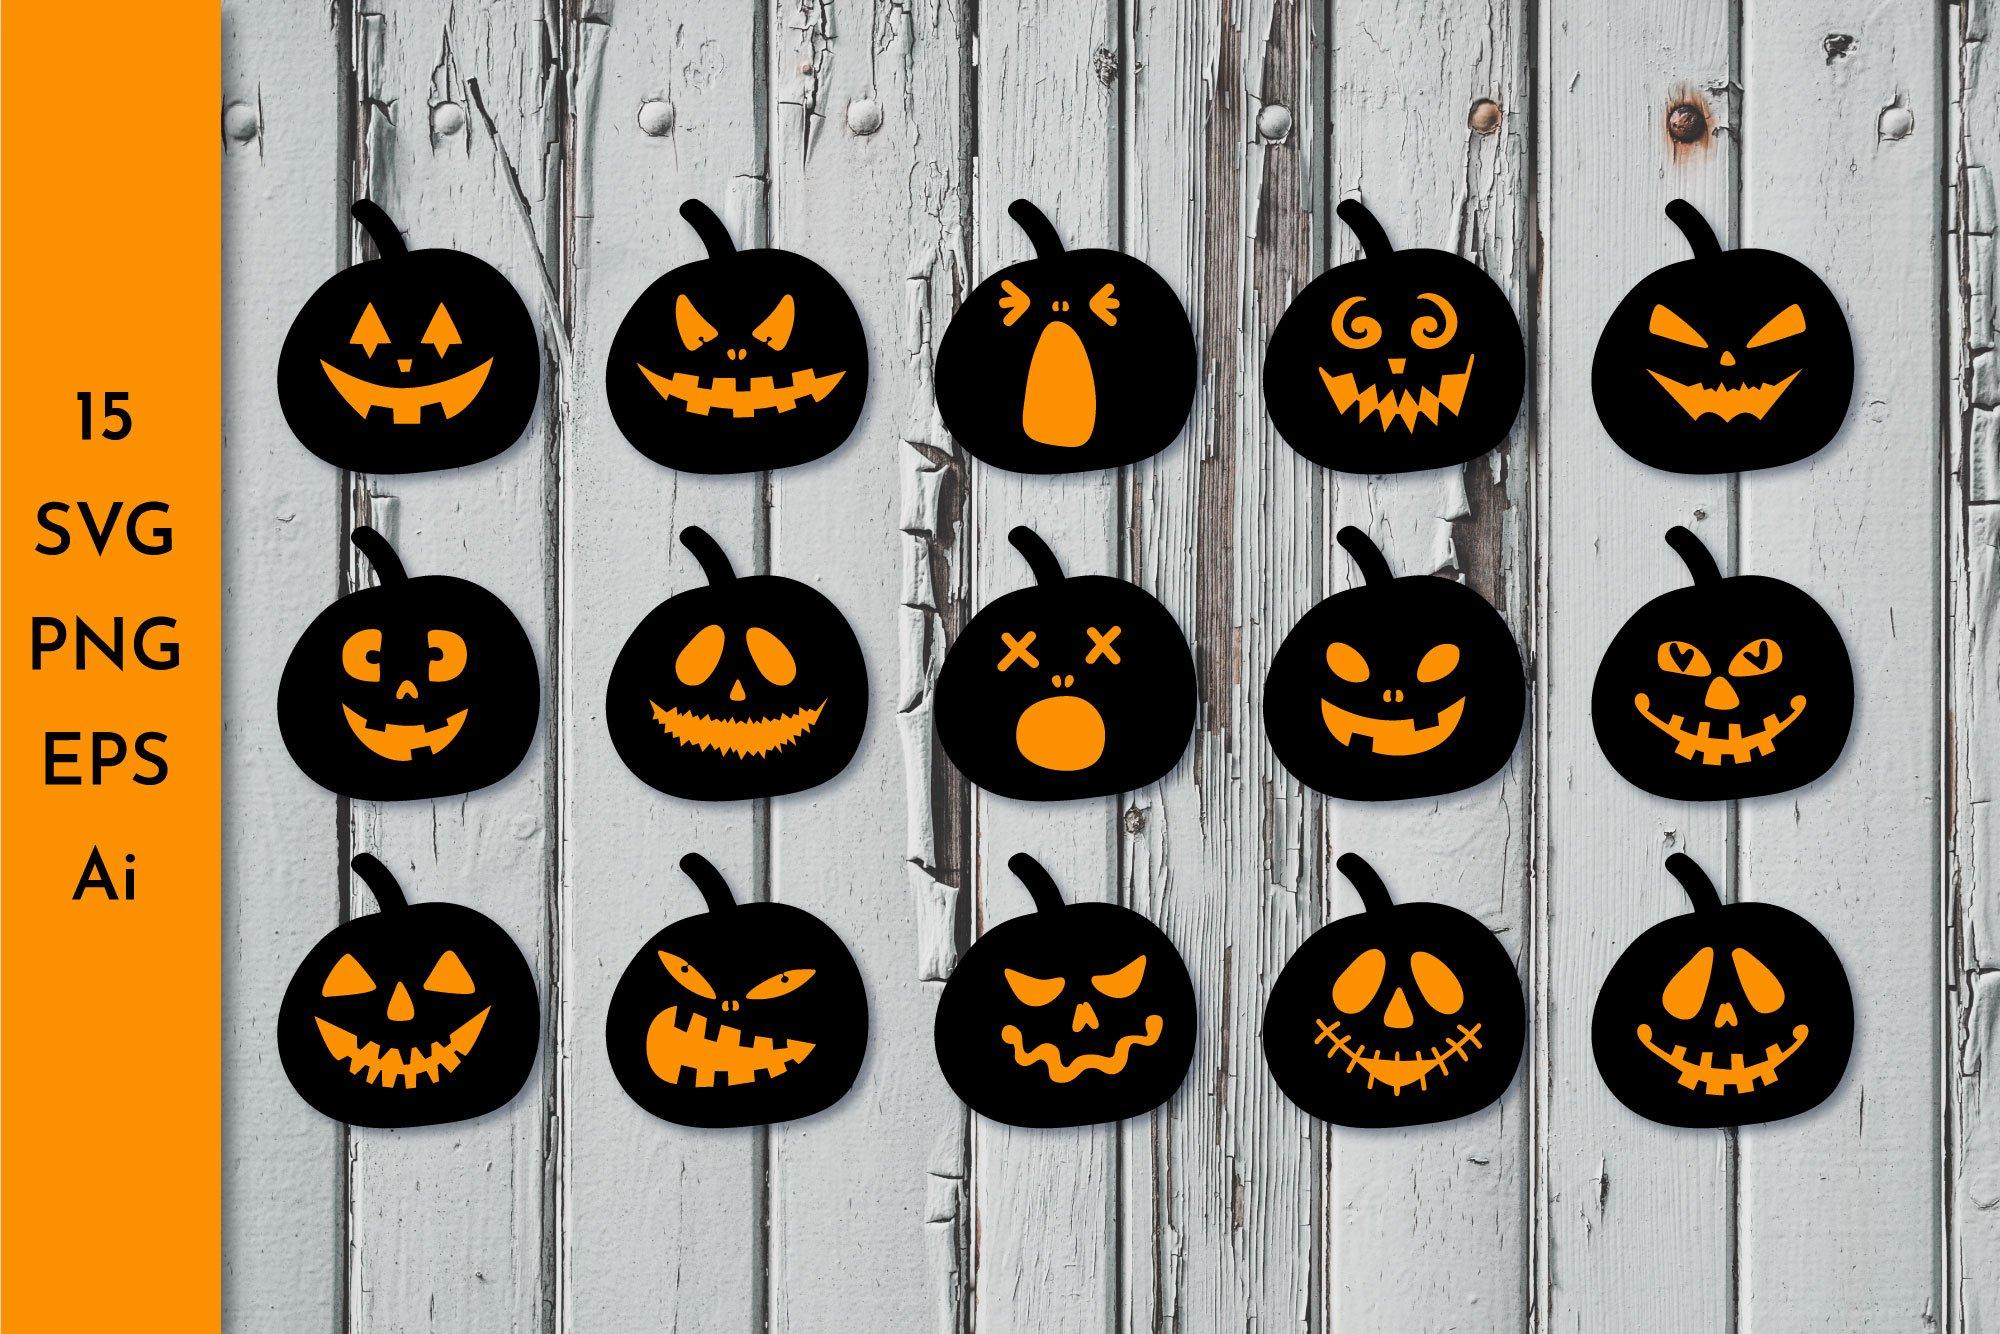 Jack O Lantern Halloween Pumpkin Svg Pre Designed Photoshop Graphics Creative Market